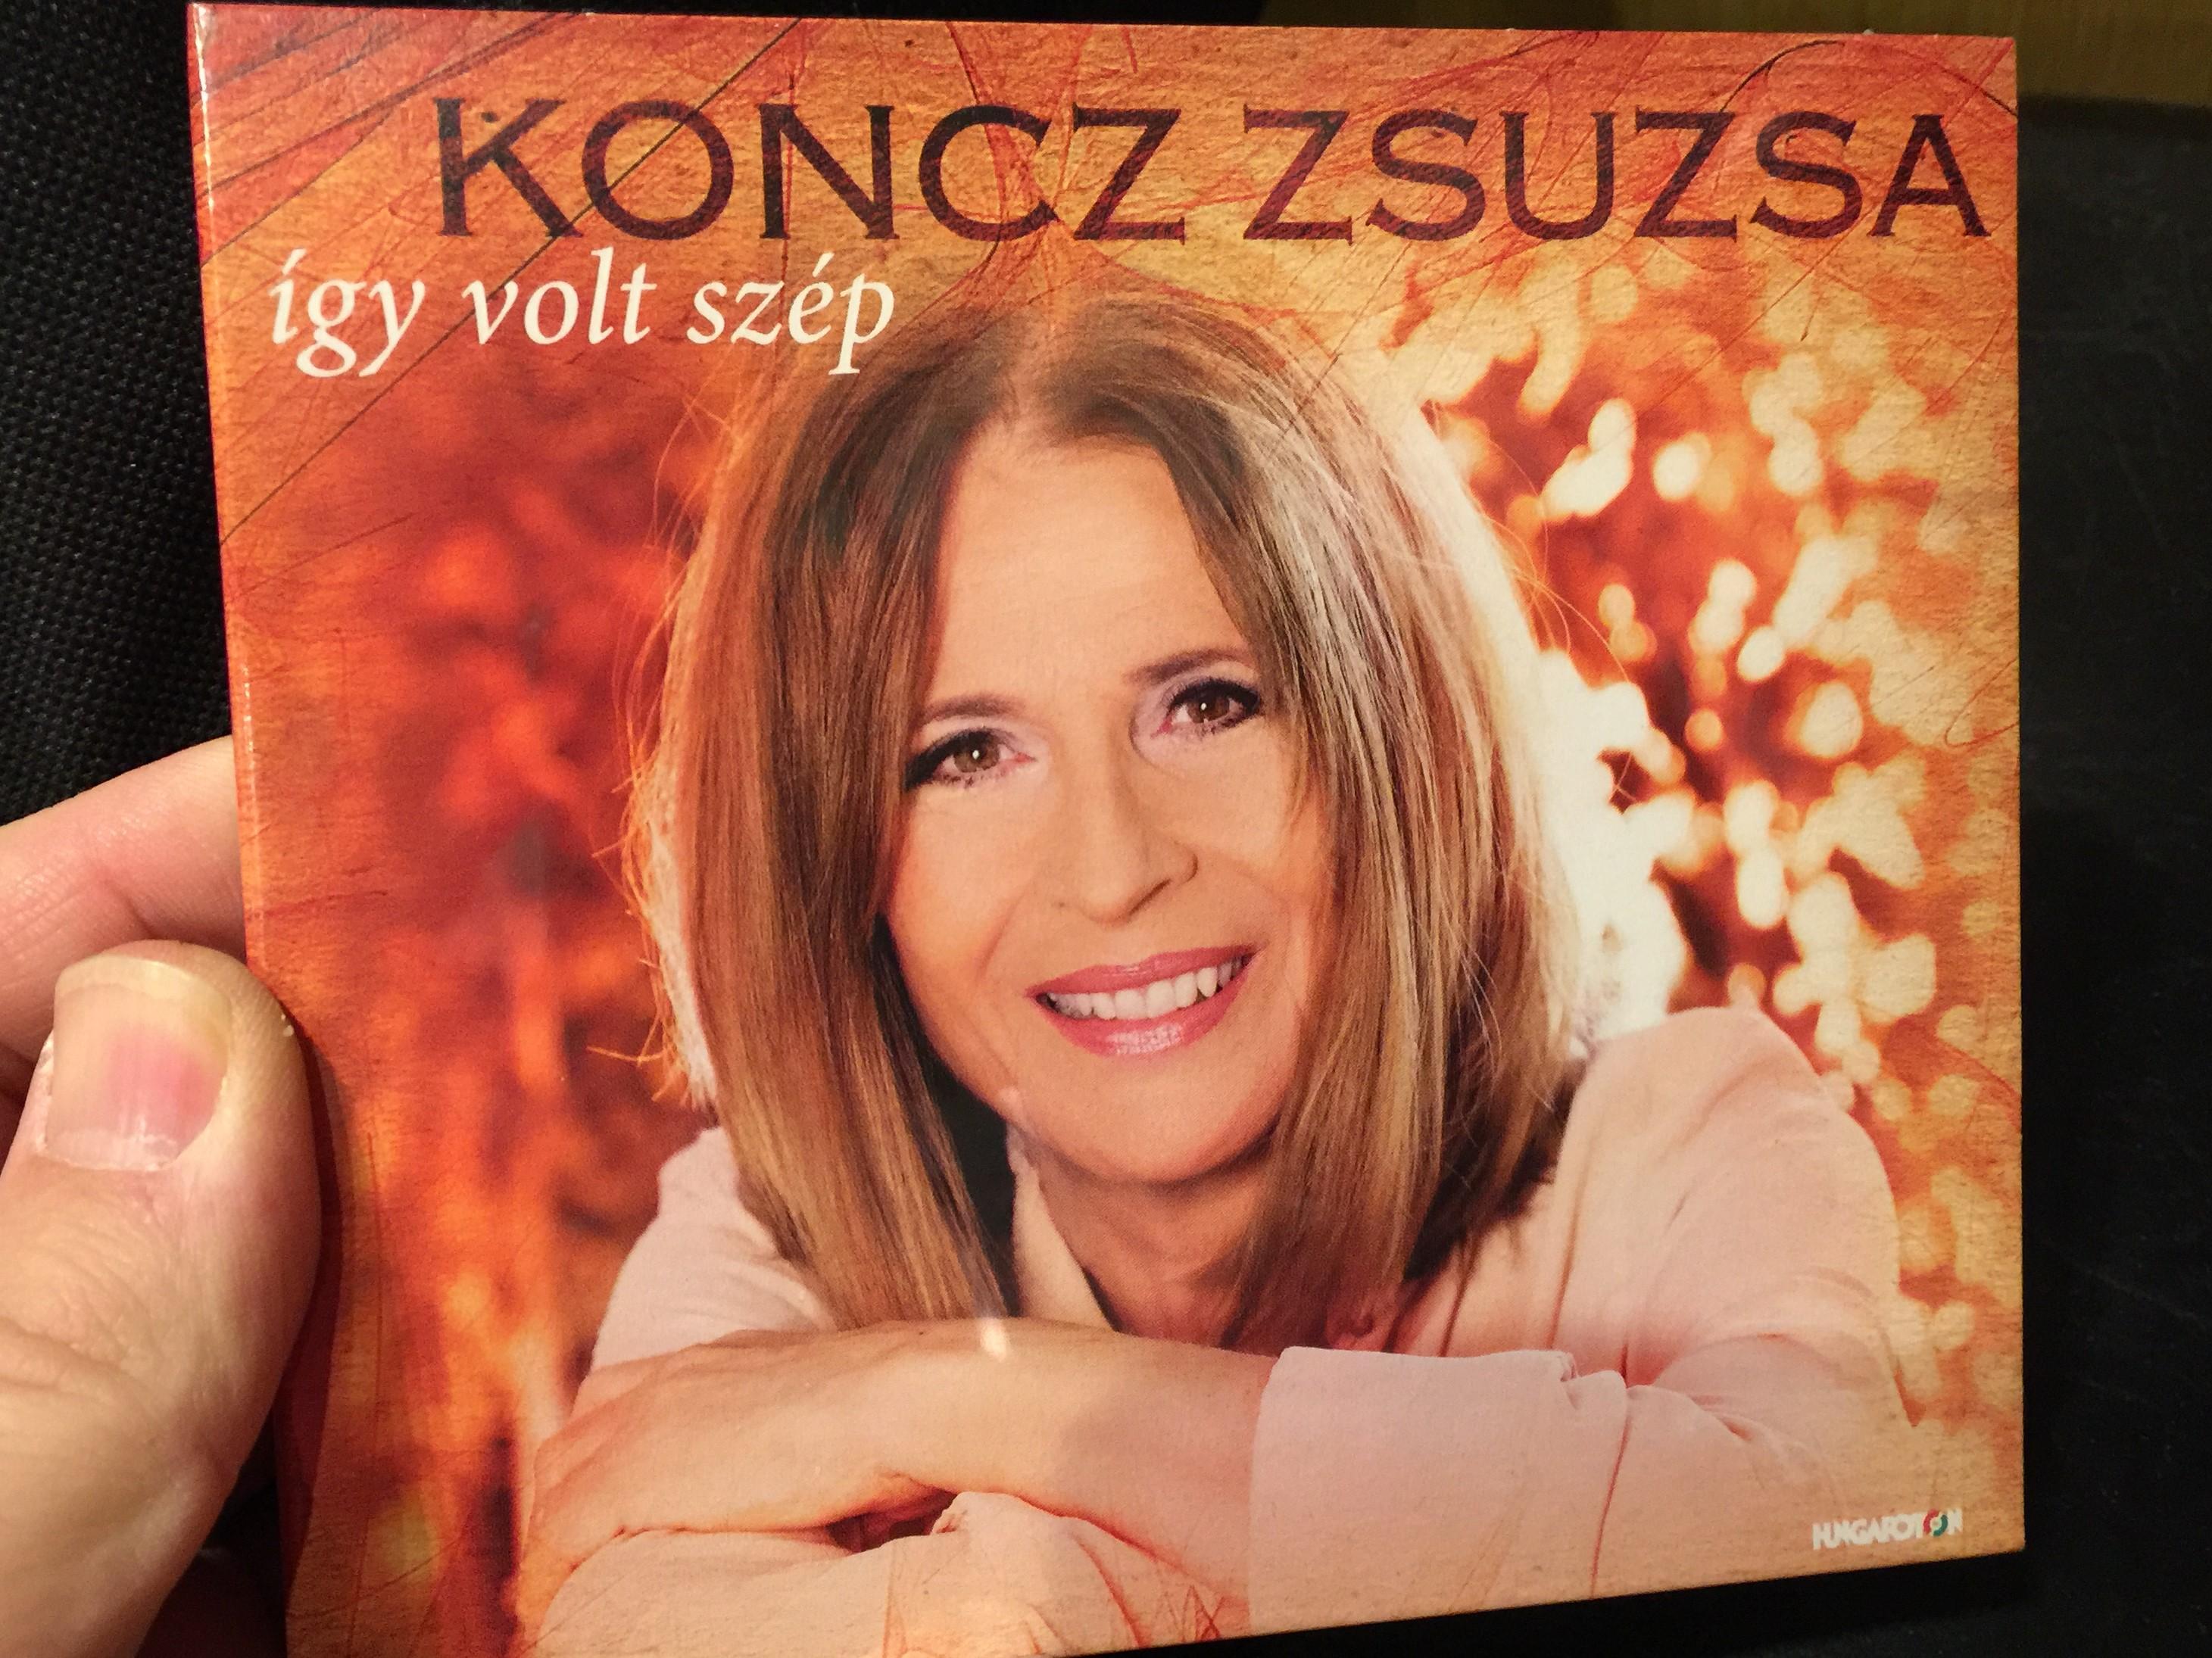 koncz-zsuzsa-gy-volt-sz-p-2cd-1-.jpg